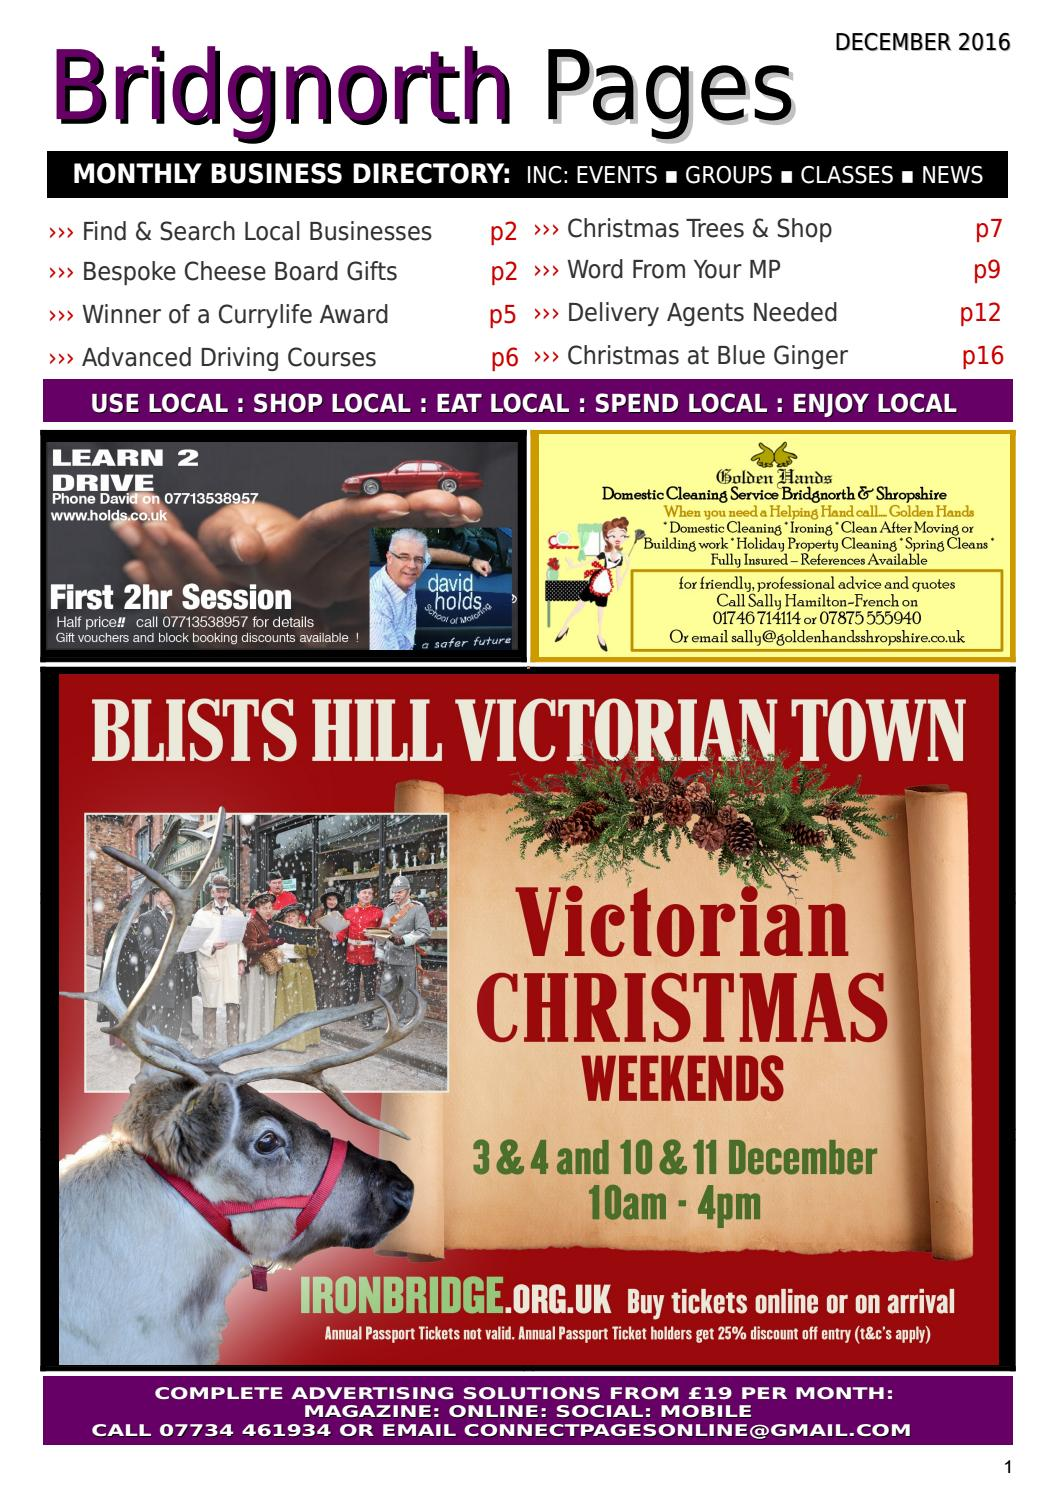 Bridgnorth Pages December 2016 by Kay Garrison - issuu